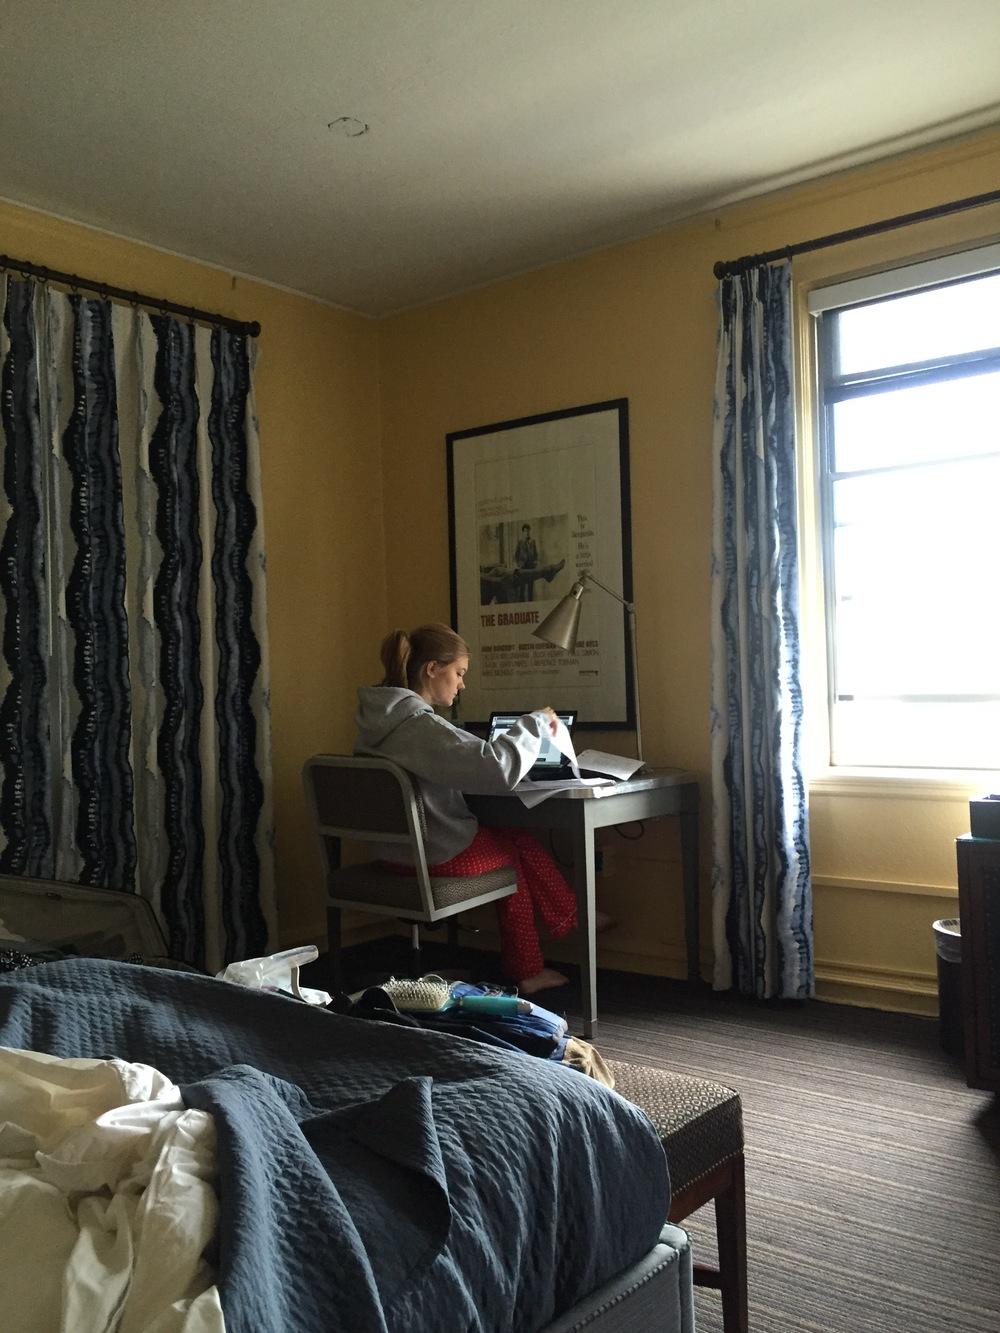 042215 motel mornings.JPG